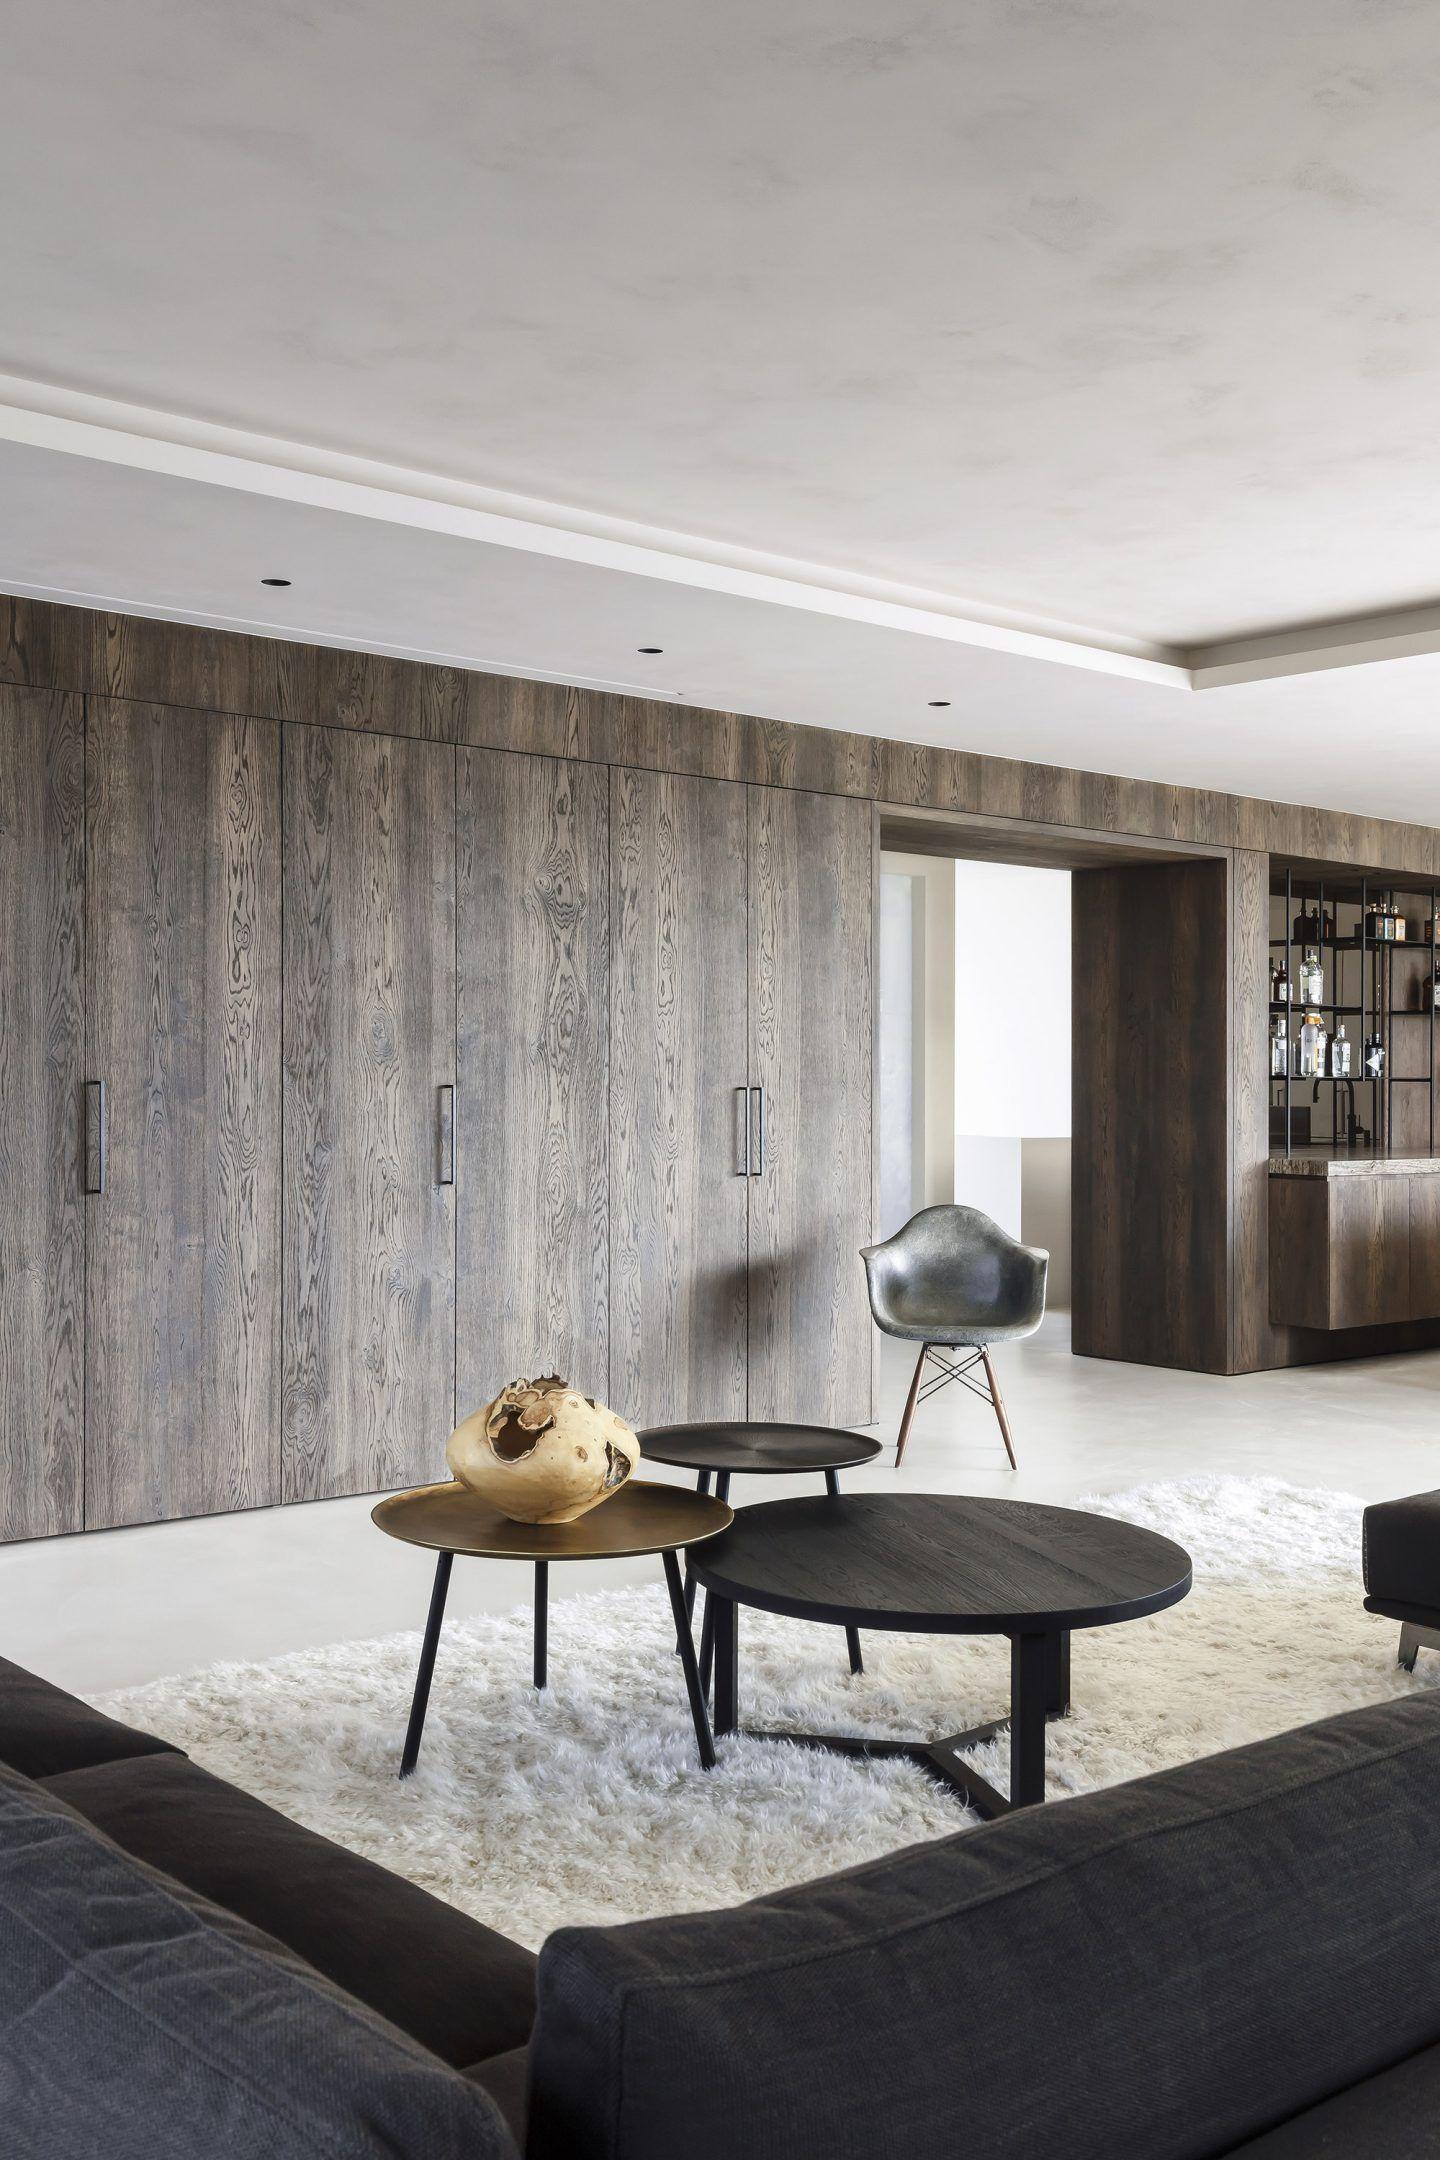 IGNANT-Architecture-Aarjan-de-Feyter-House-Ham-02